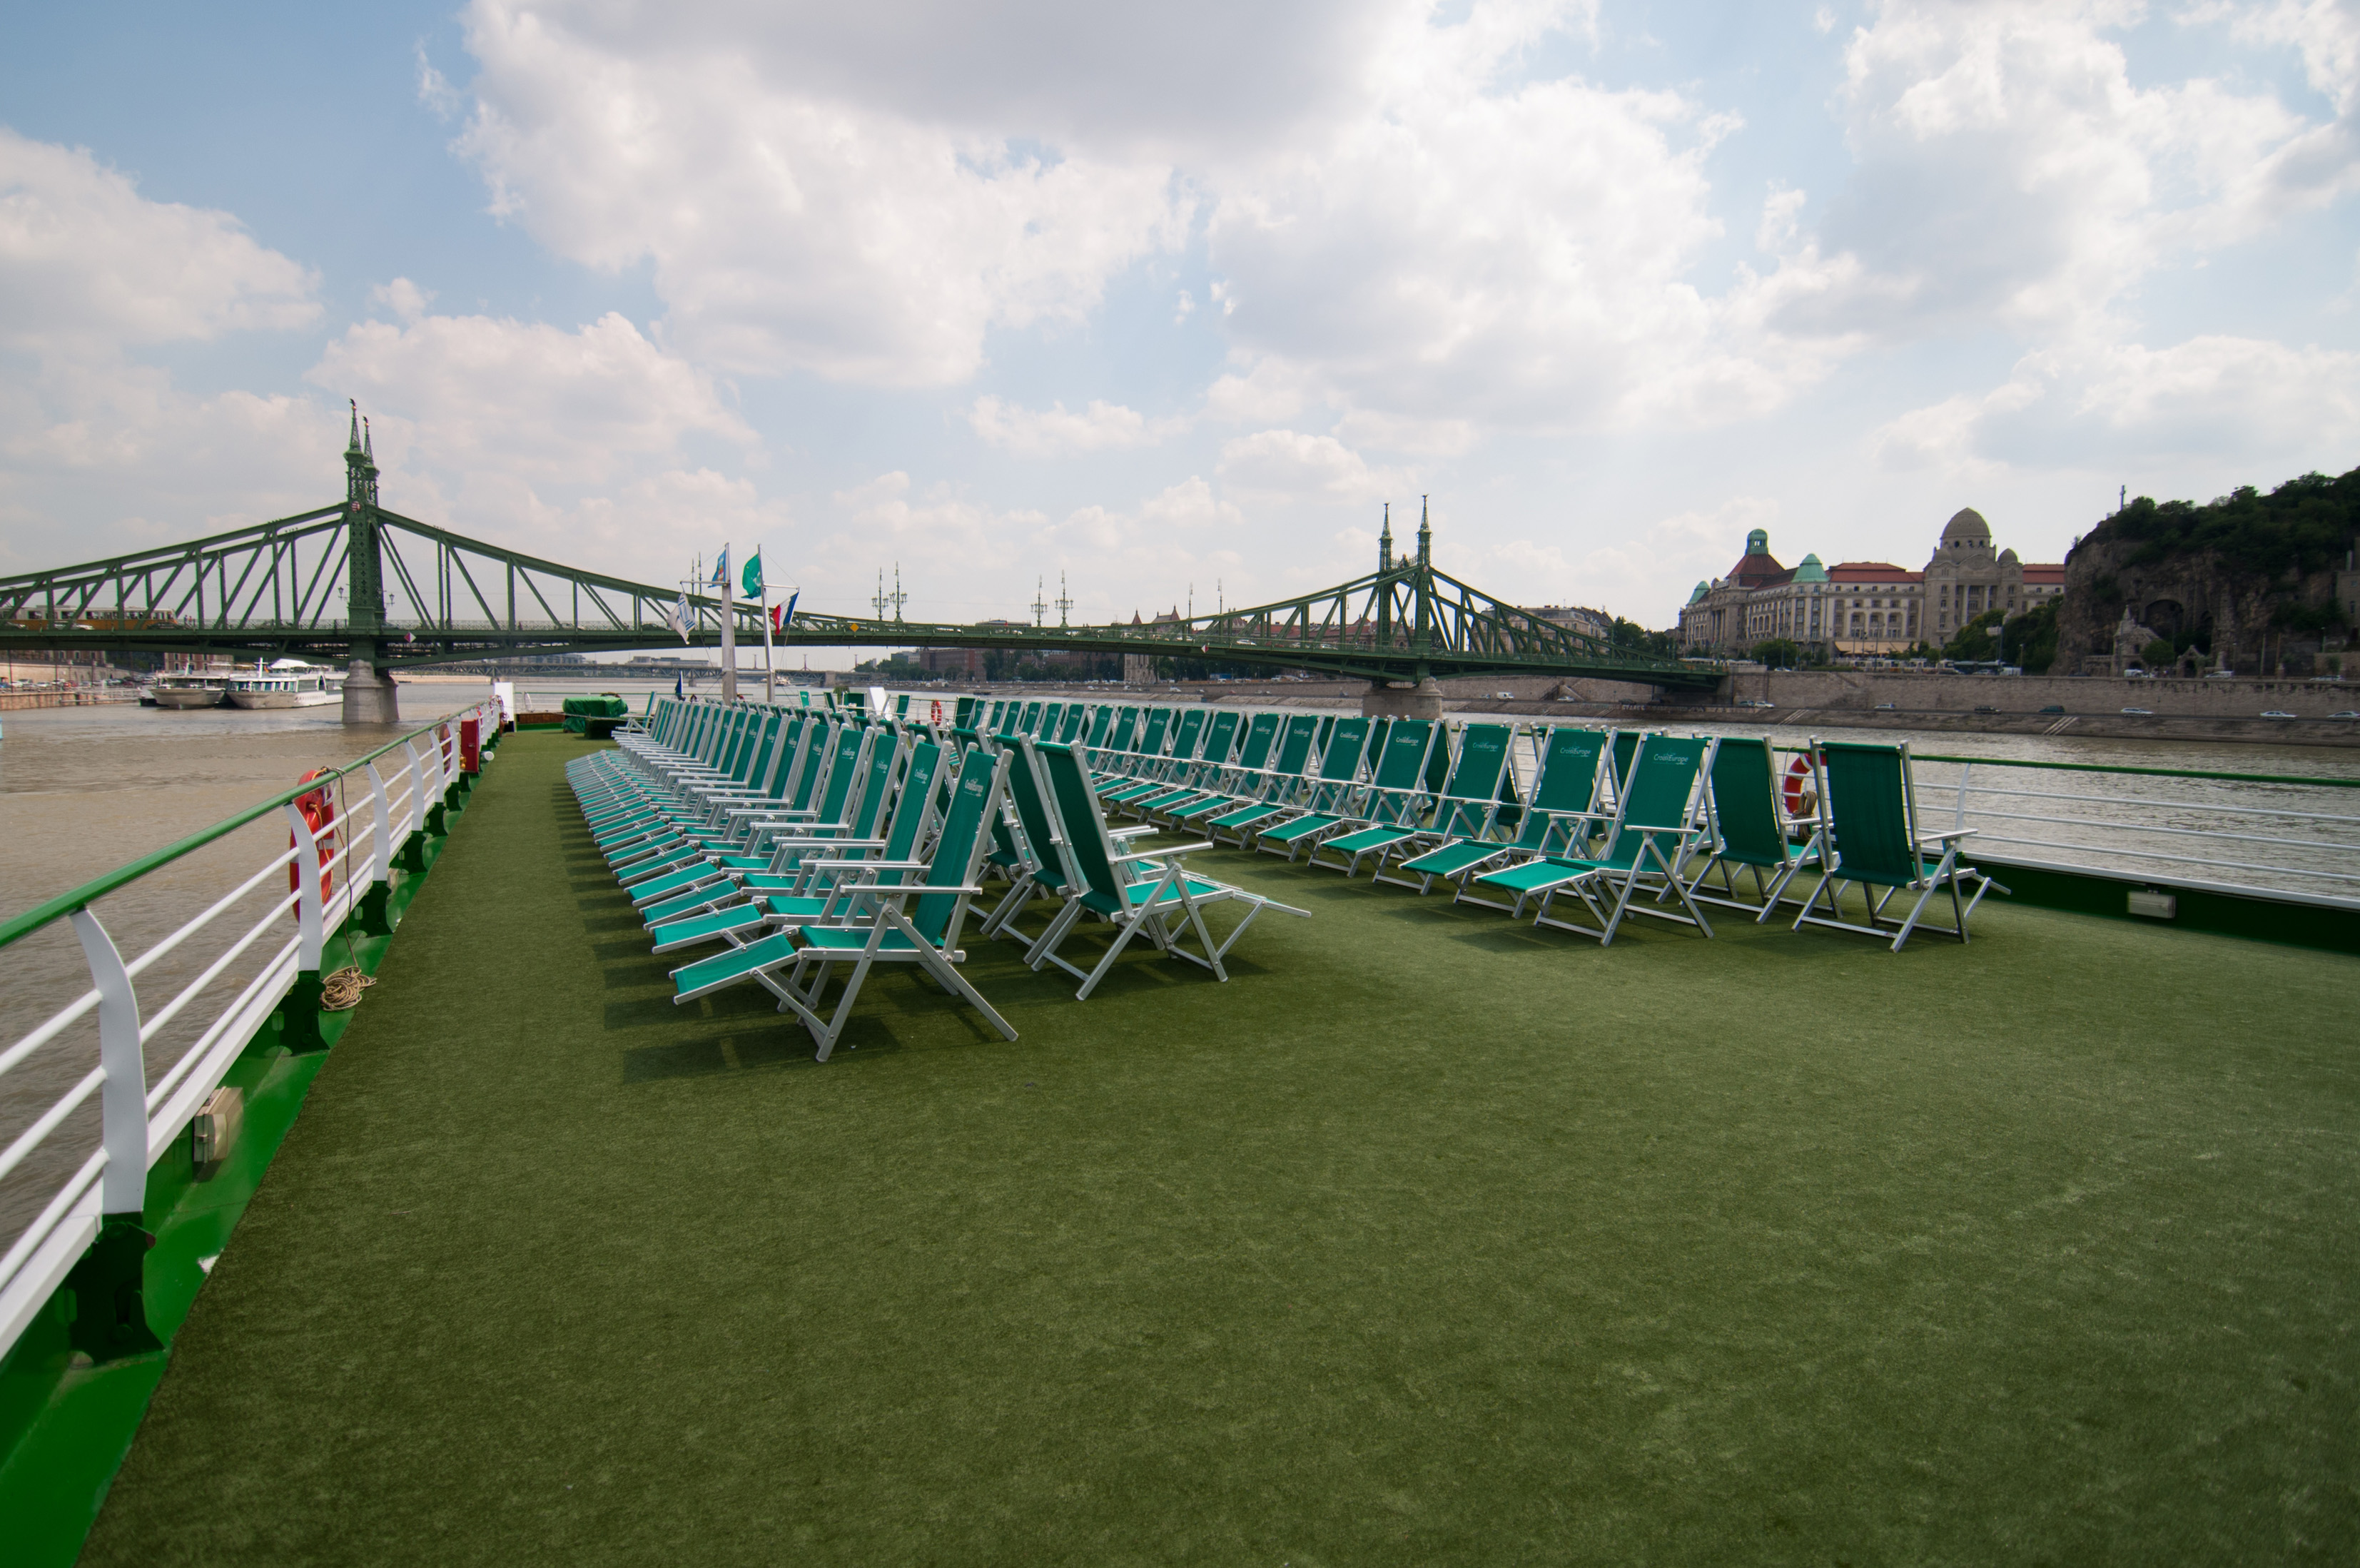 CroisiEurope MS Monet Exterior Sun Deck Lounge Chairs 1.jpg